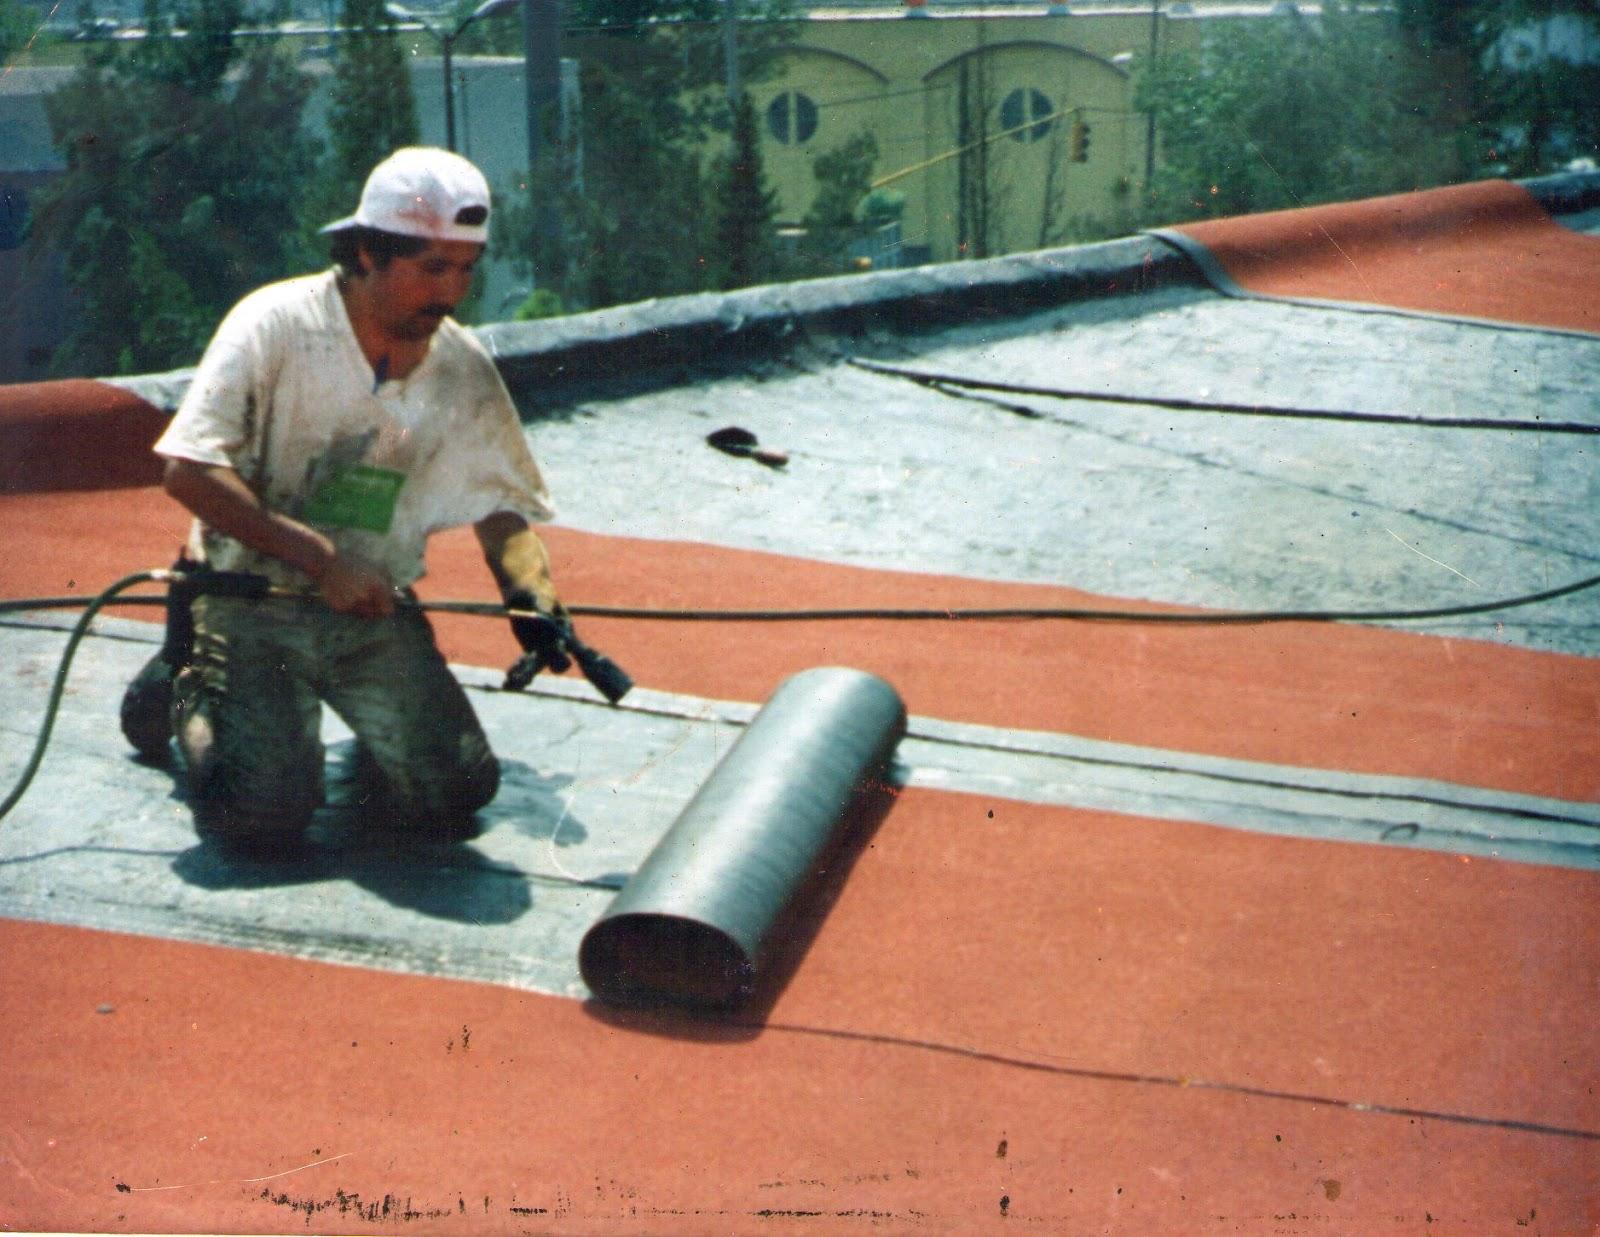 Cesar rodr guez impermeabilizaci n garantizada 15 05 11 22 05 11 - Impermeabilizacion de tejados ...